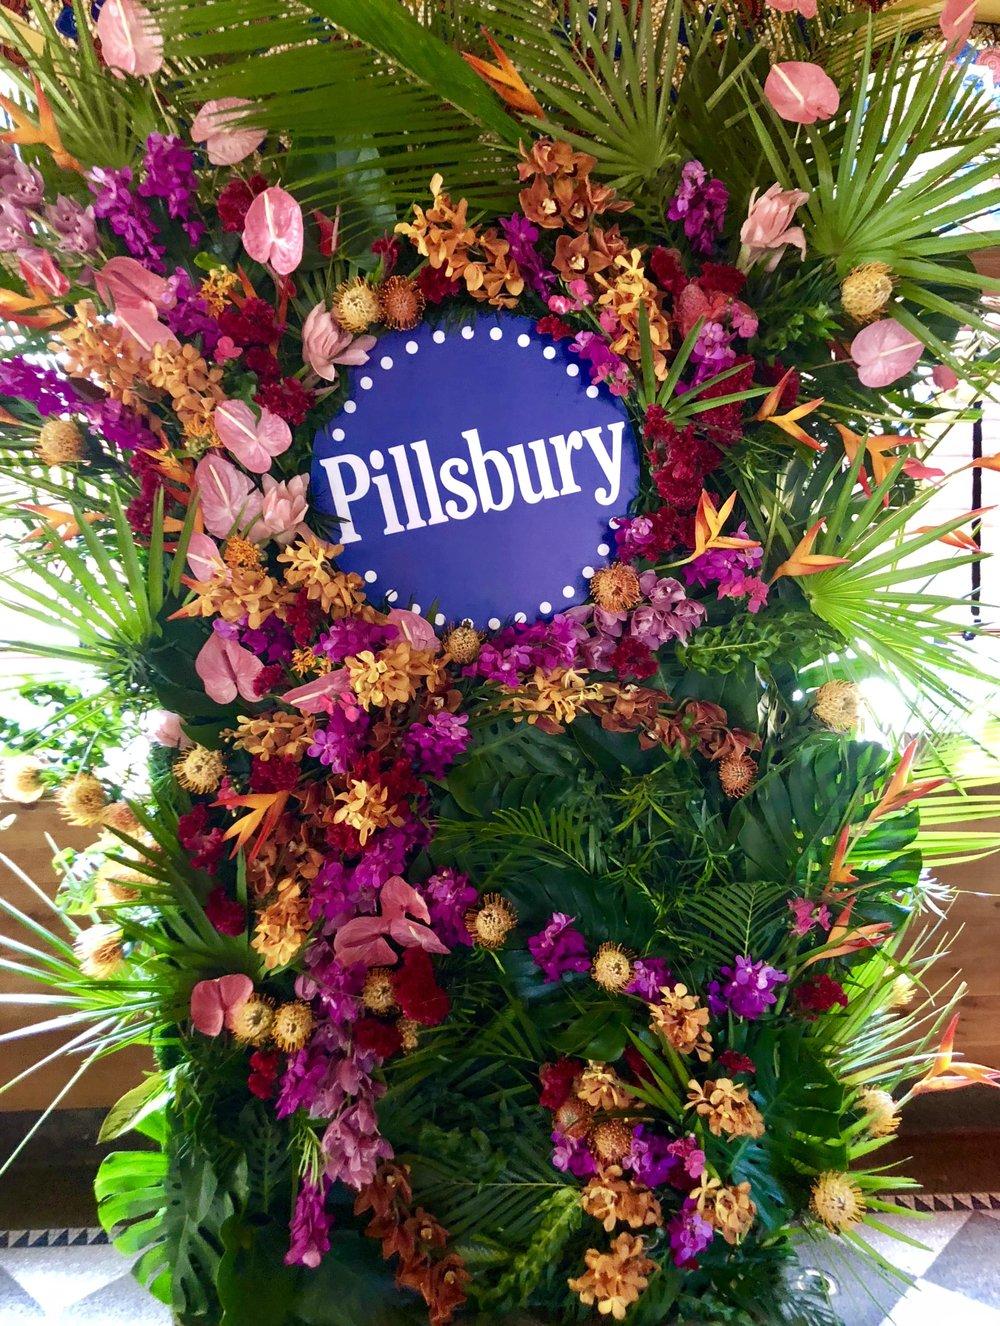 Pillsbury Hawaiian Rolls Flower Wall- B Floral